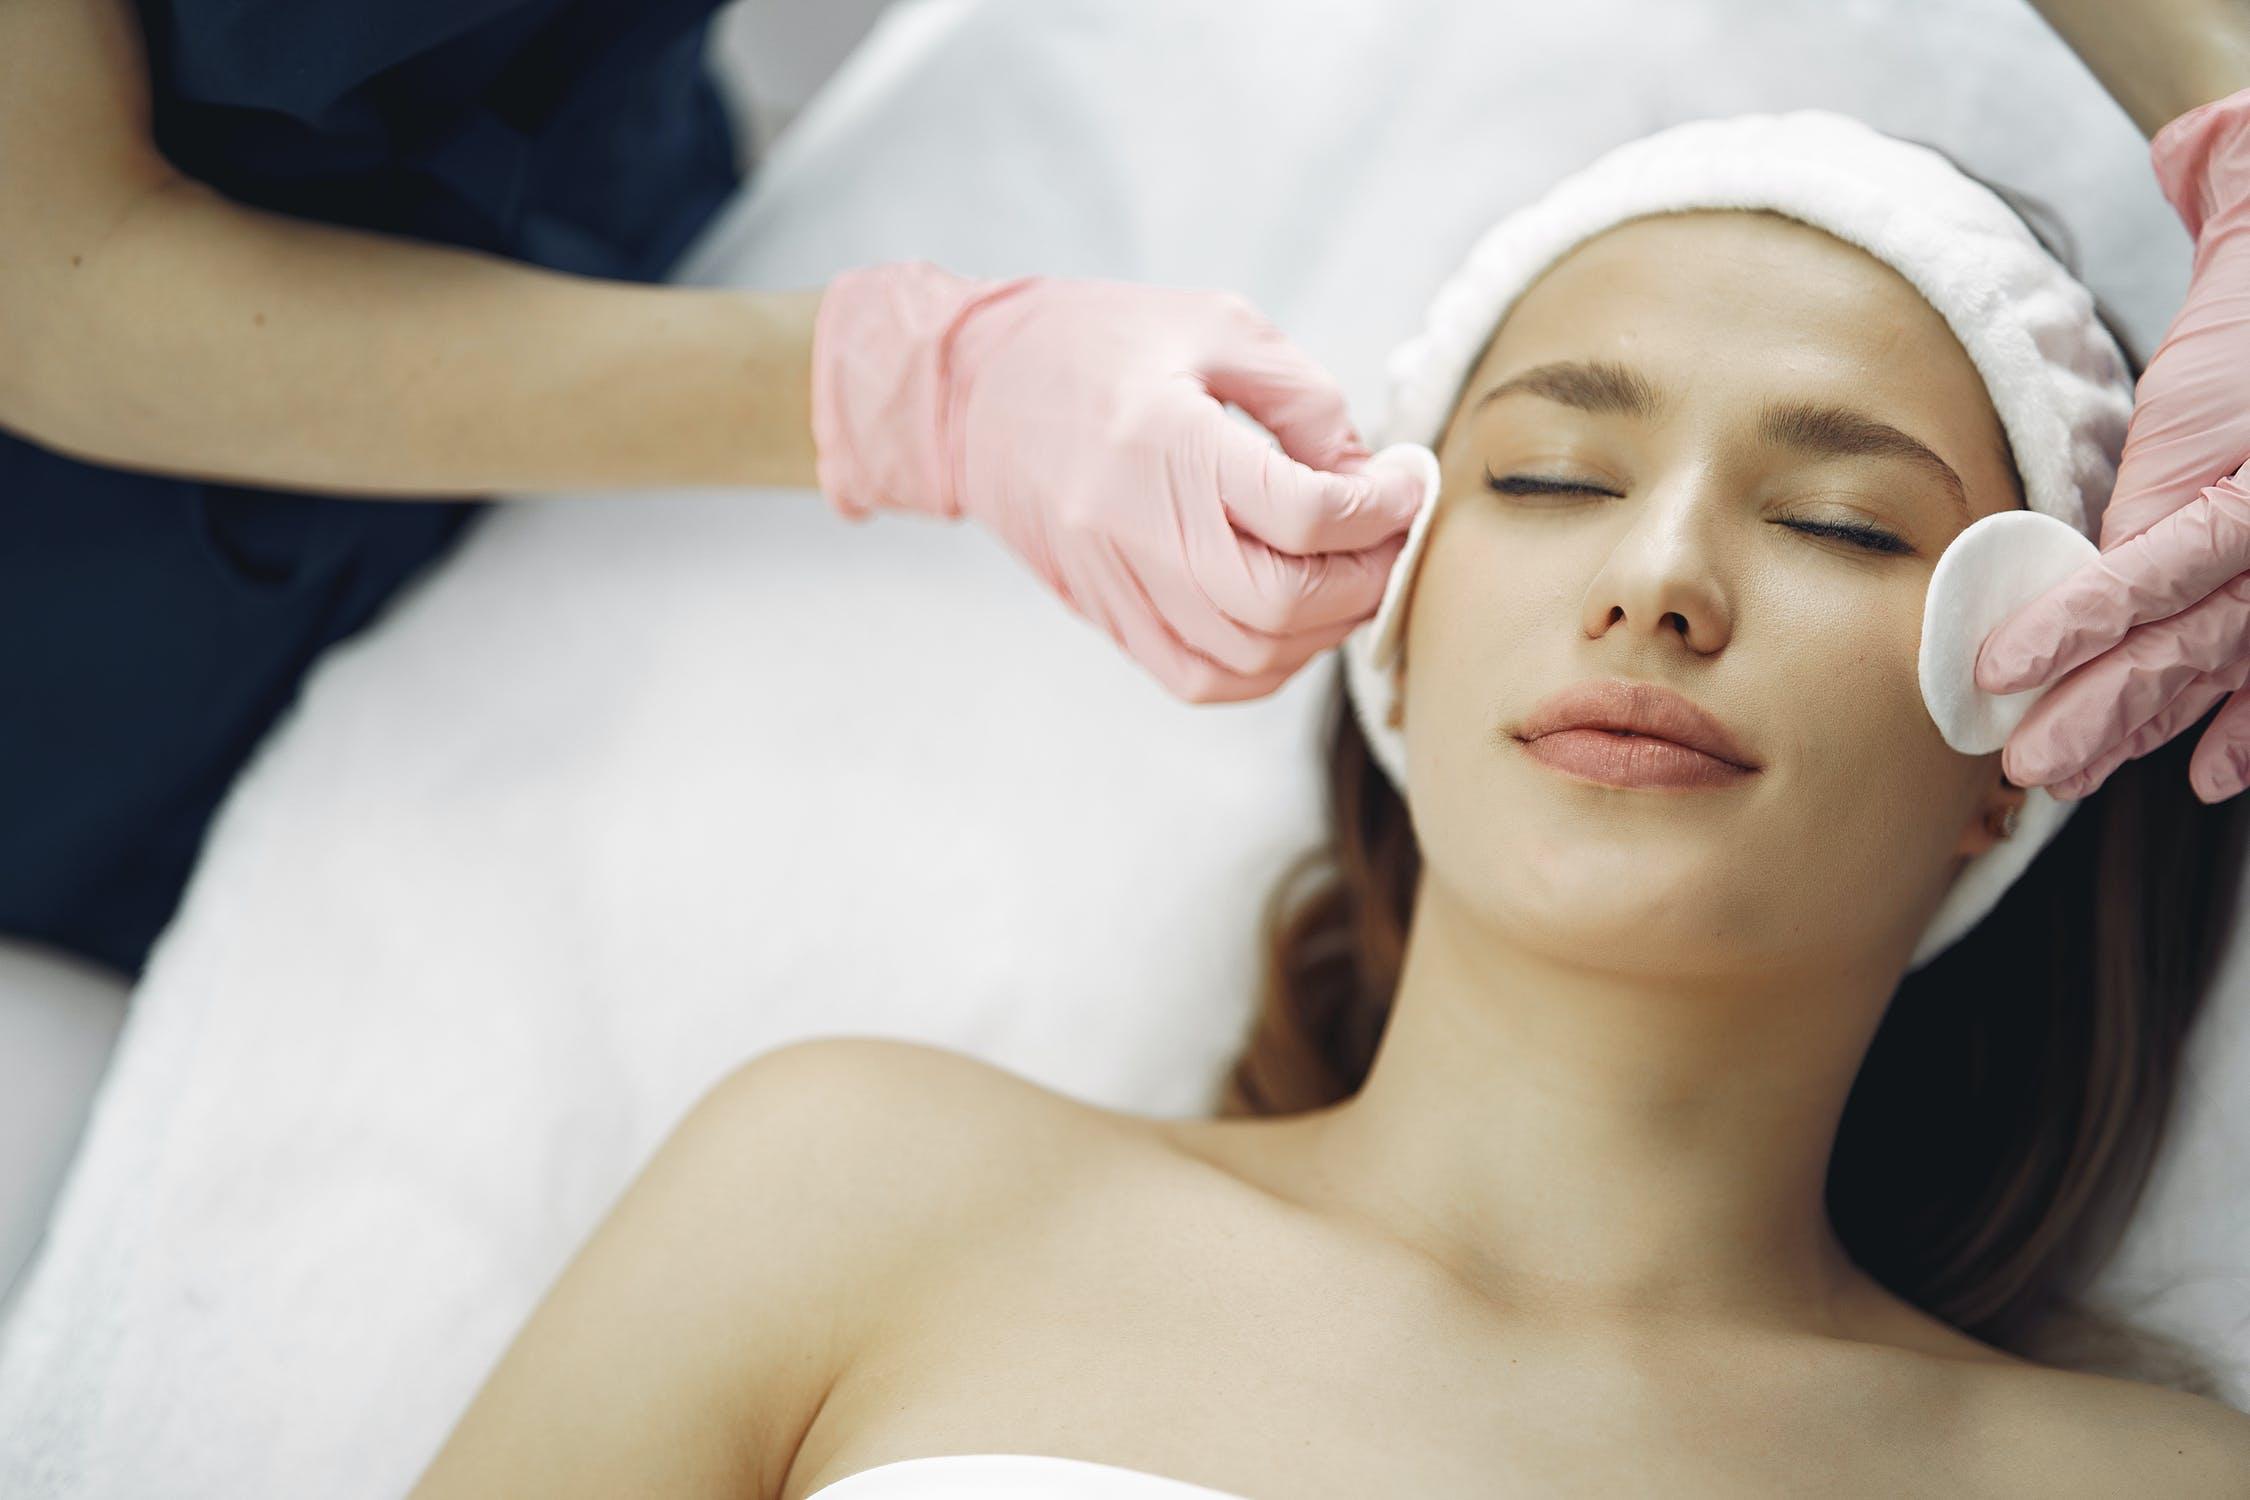 Established Beauty Salon with Reputable Franchise $181k+ Profits